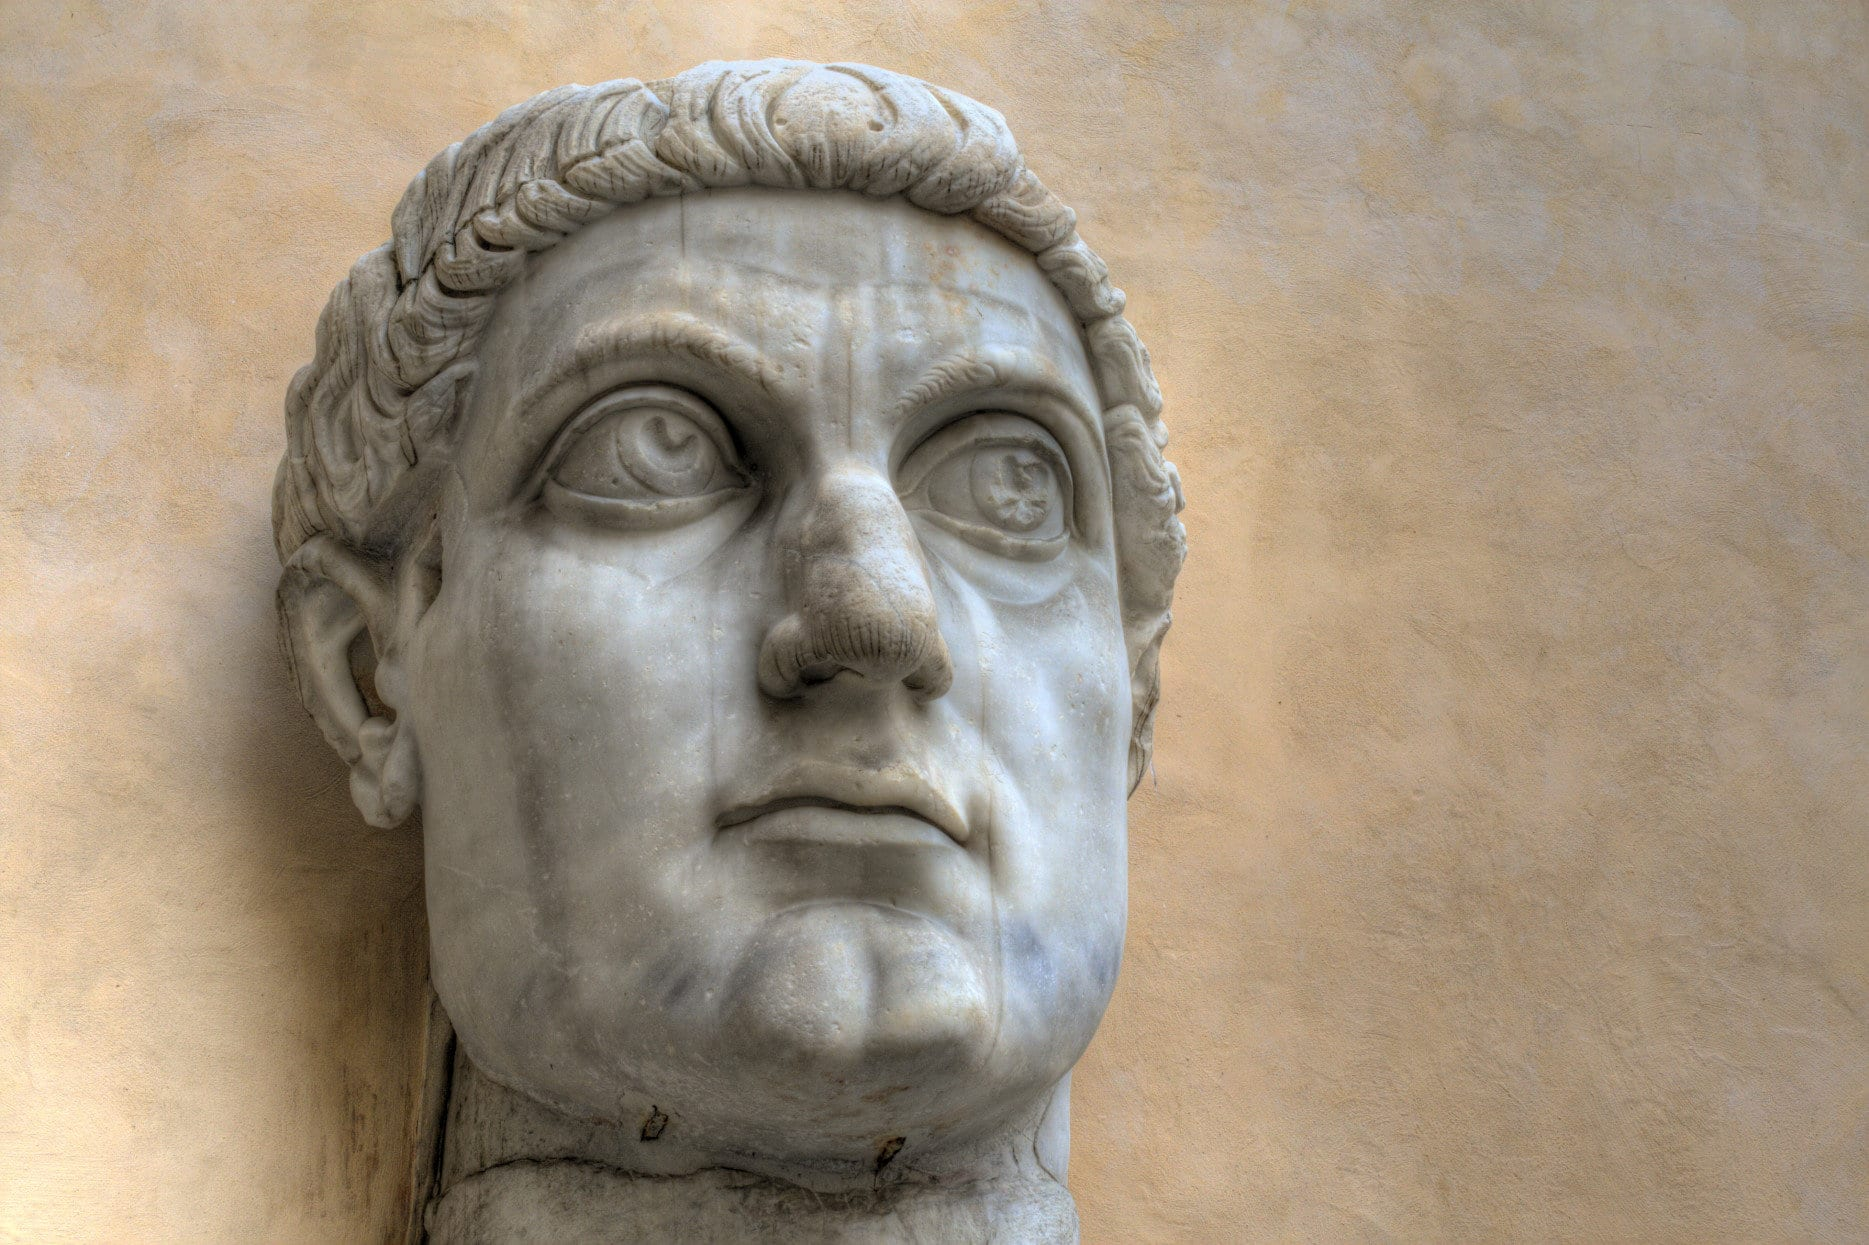 Statue of of the Roman Emperor Constantine